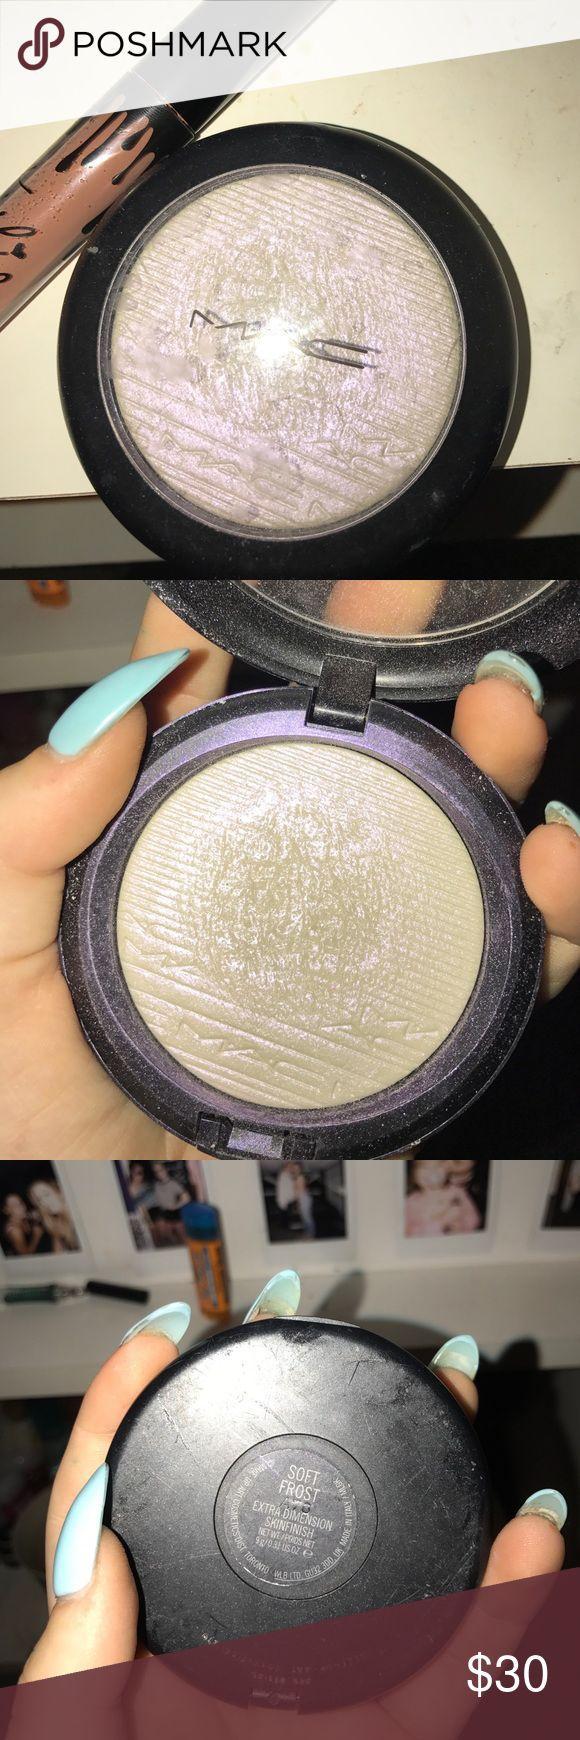 Mac highlighter Pigmented MAC Cosmetics Makeup Luminizer